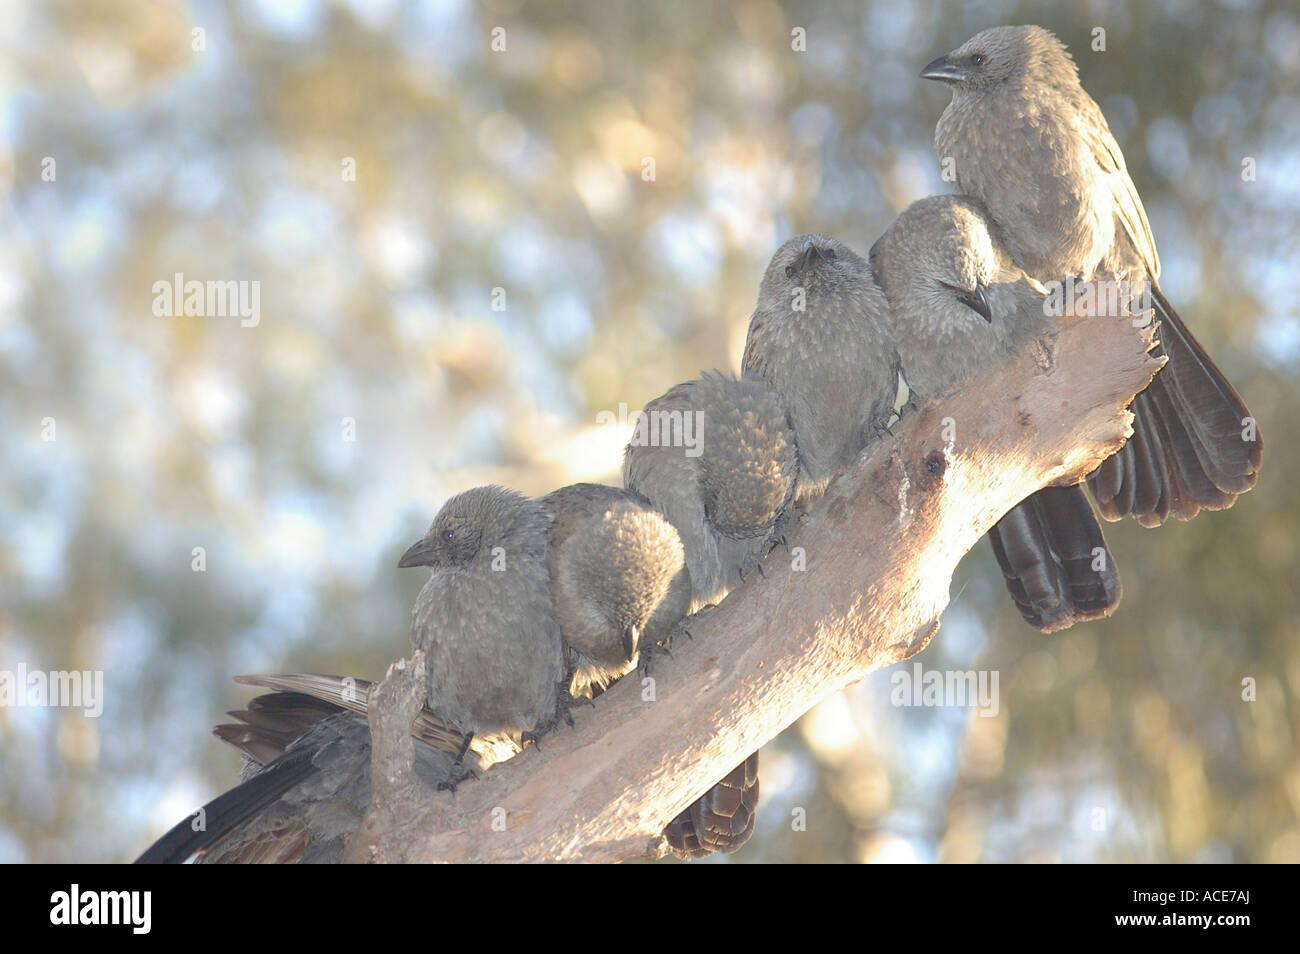 Flock of Apostlebirds - Stock Image